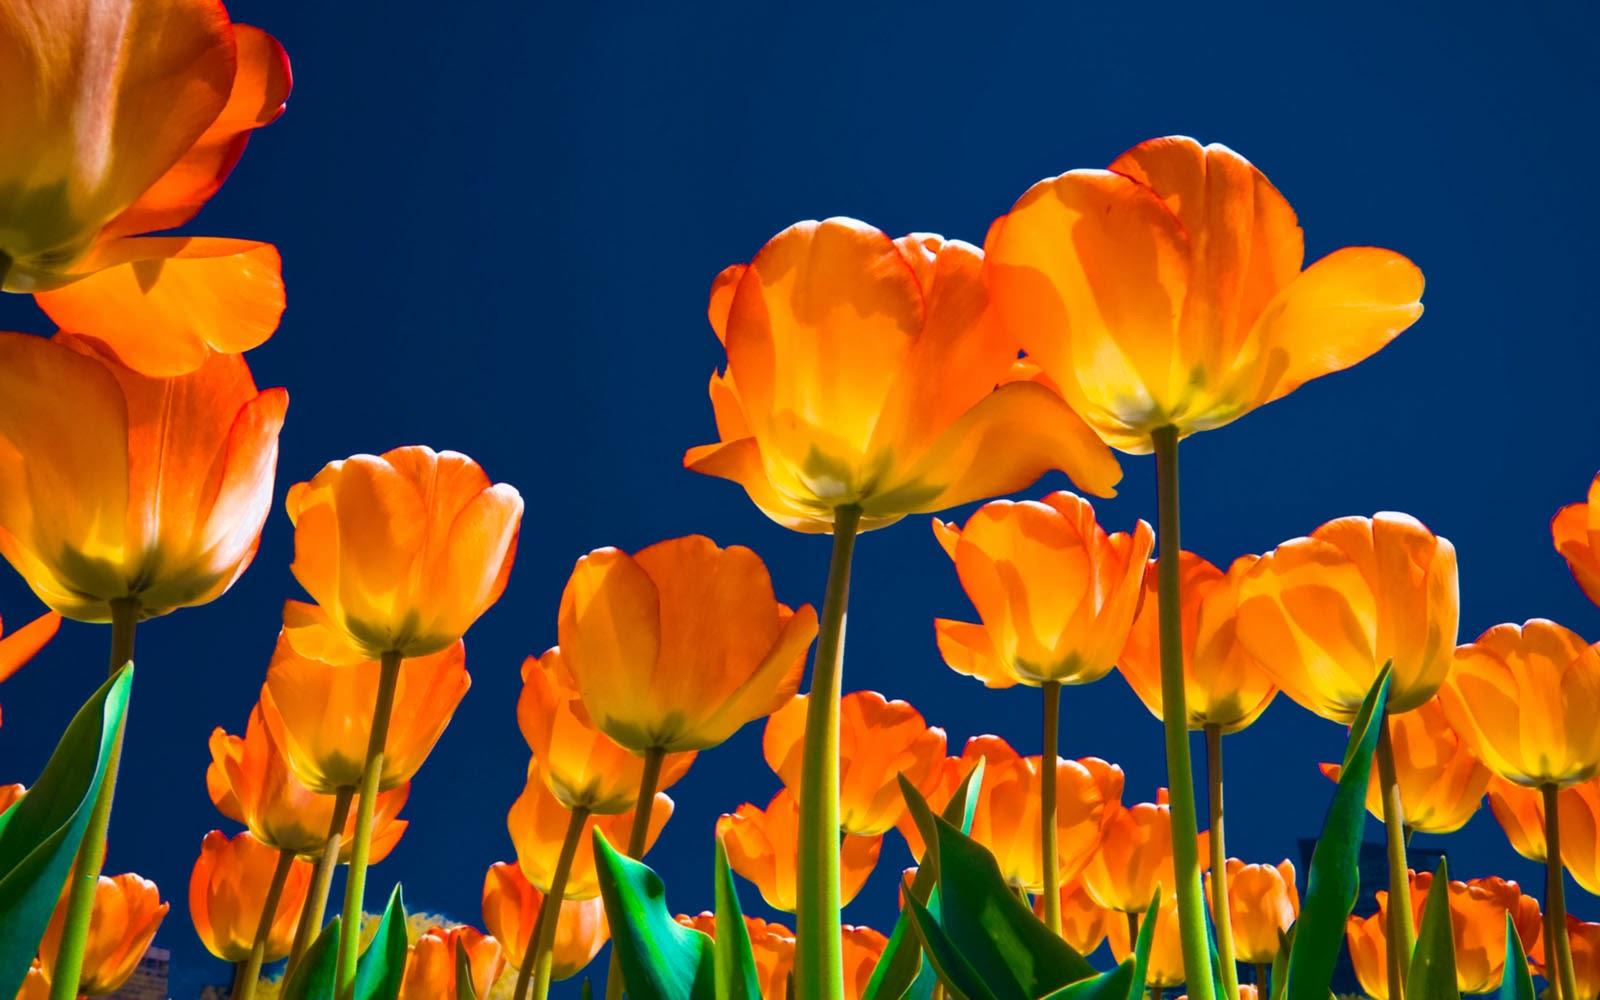 Spring Desktop Backgrounds Nature 1600x1000 Download Hd Wallpaper Wallpapertip